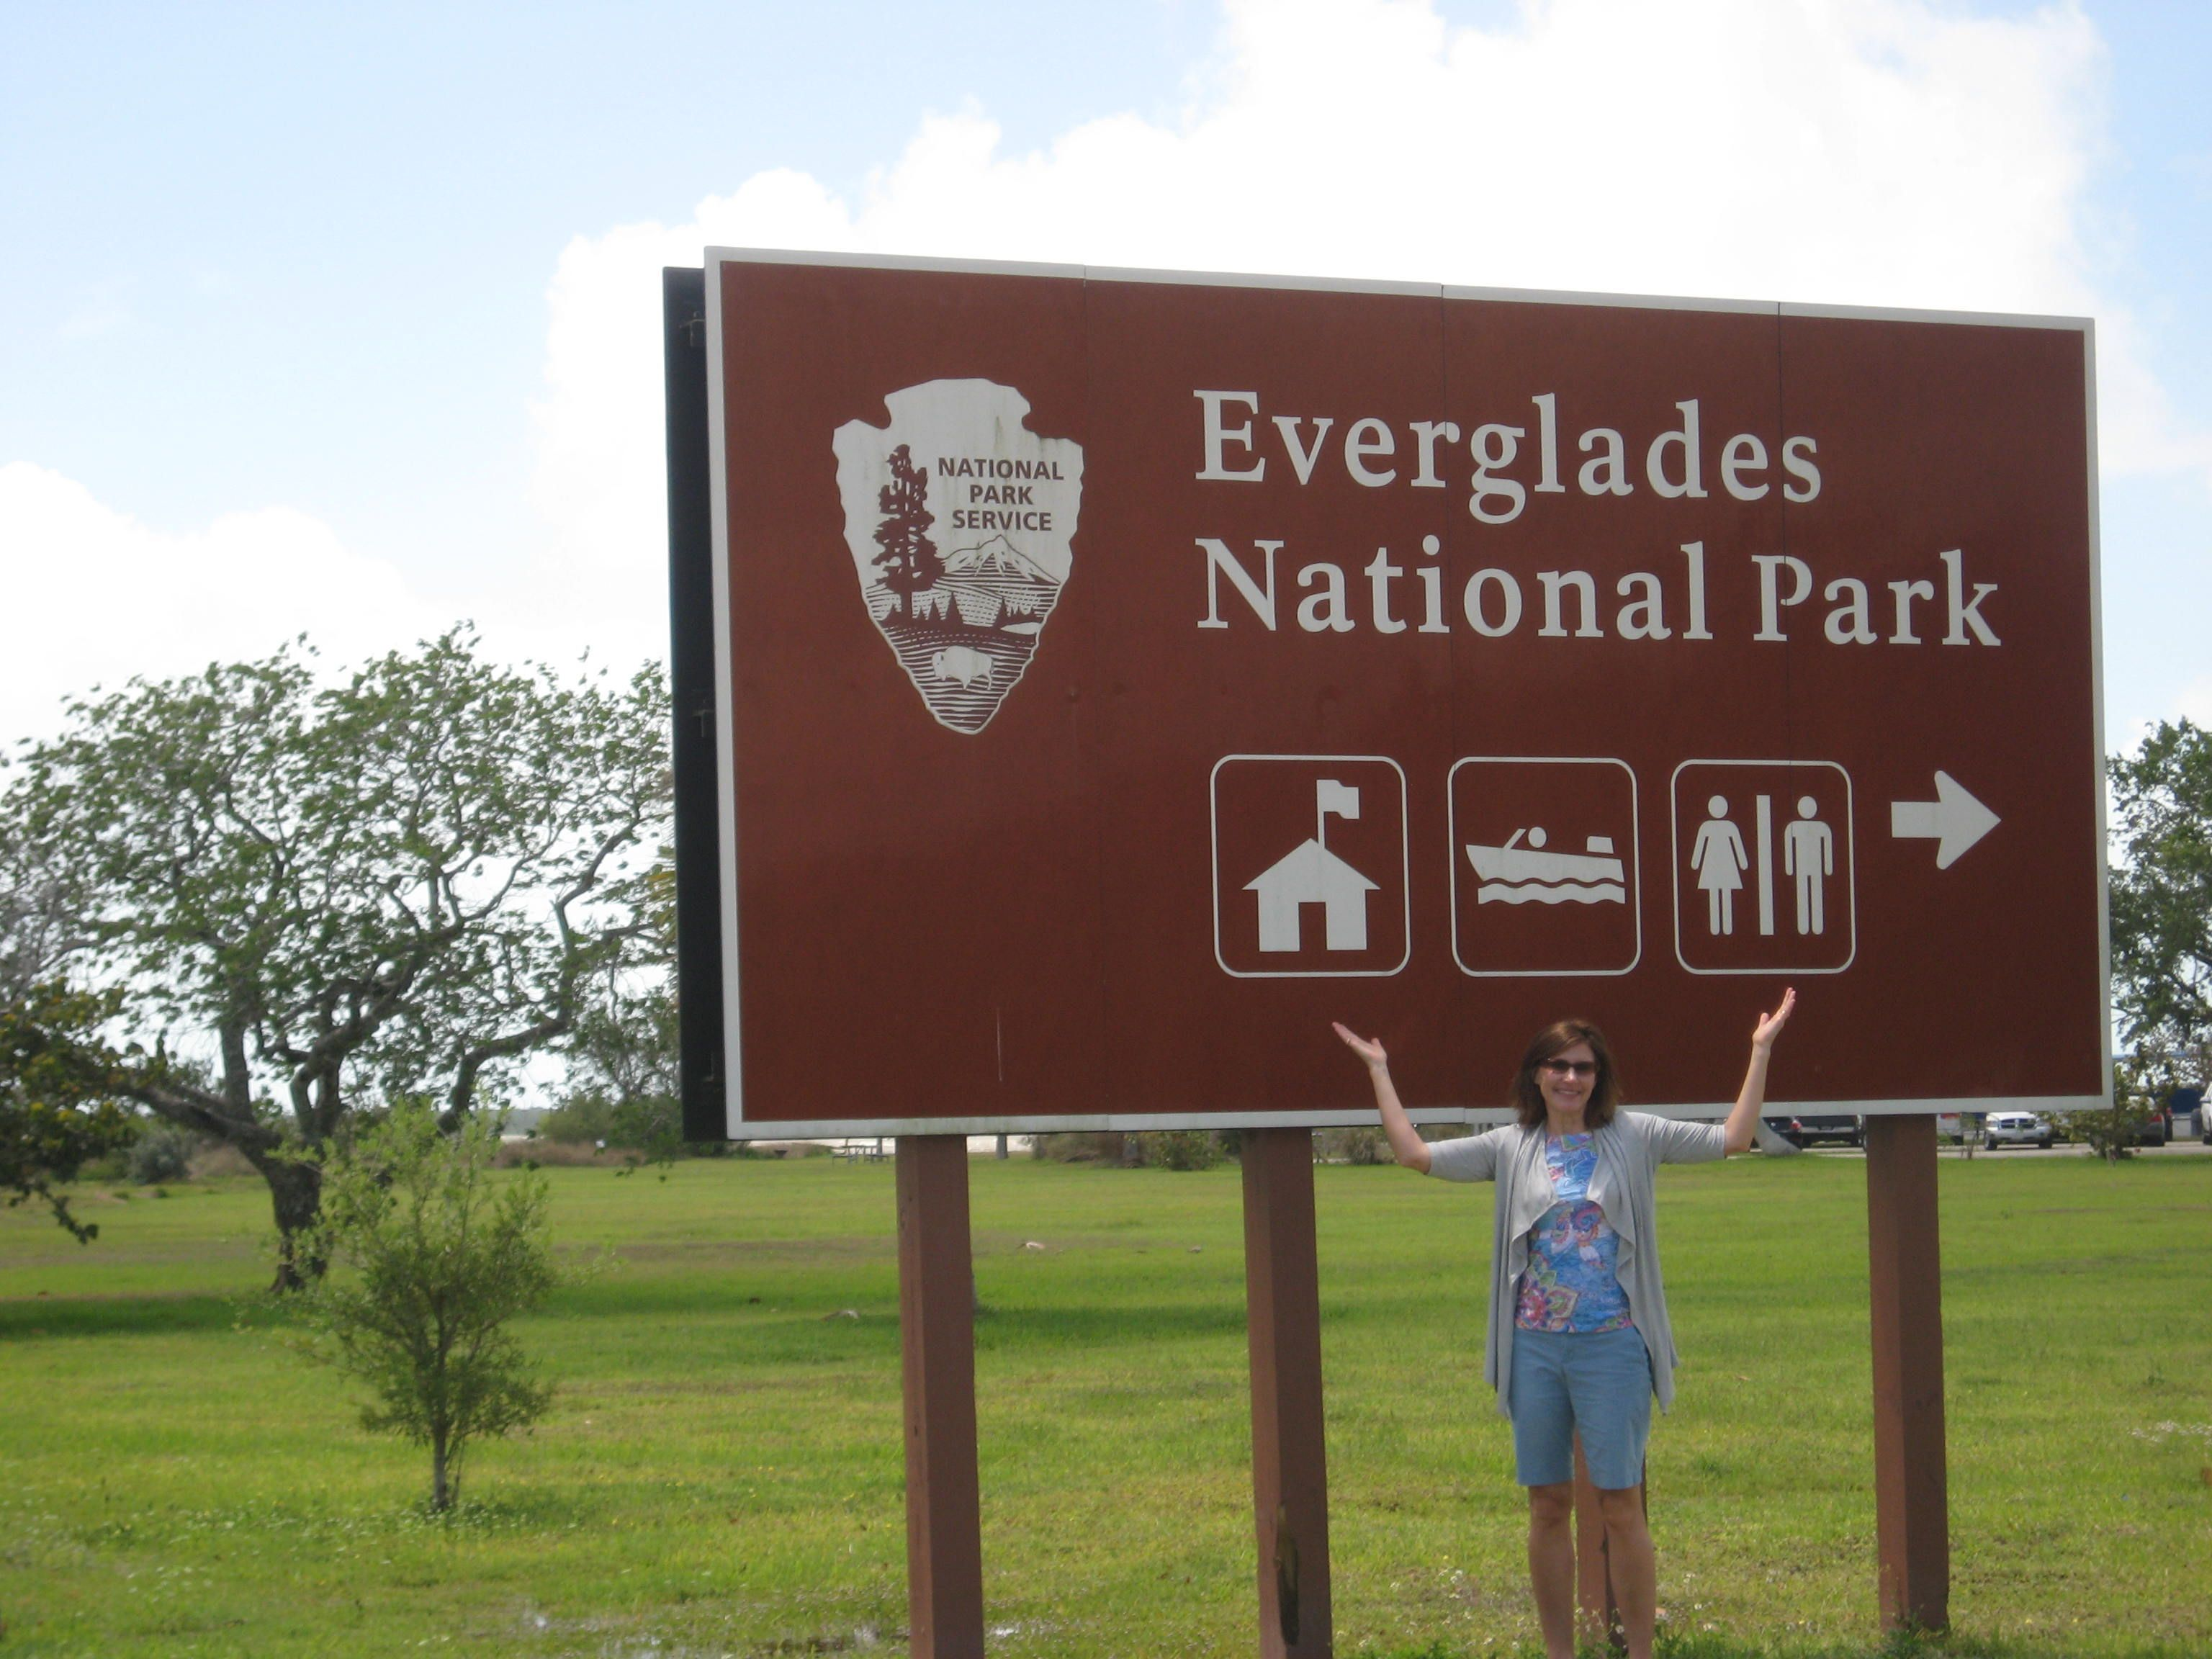 Everglades Everglades National Park Visit Florida National Parks